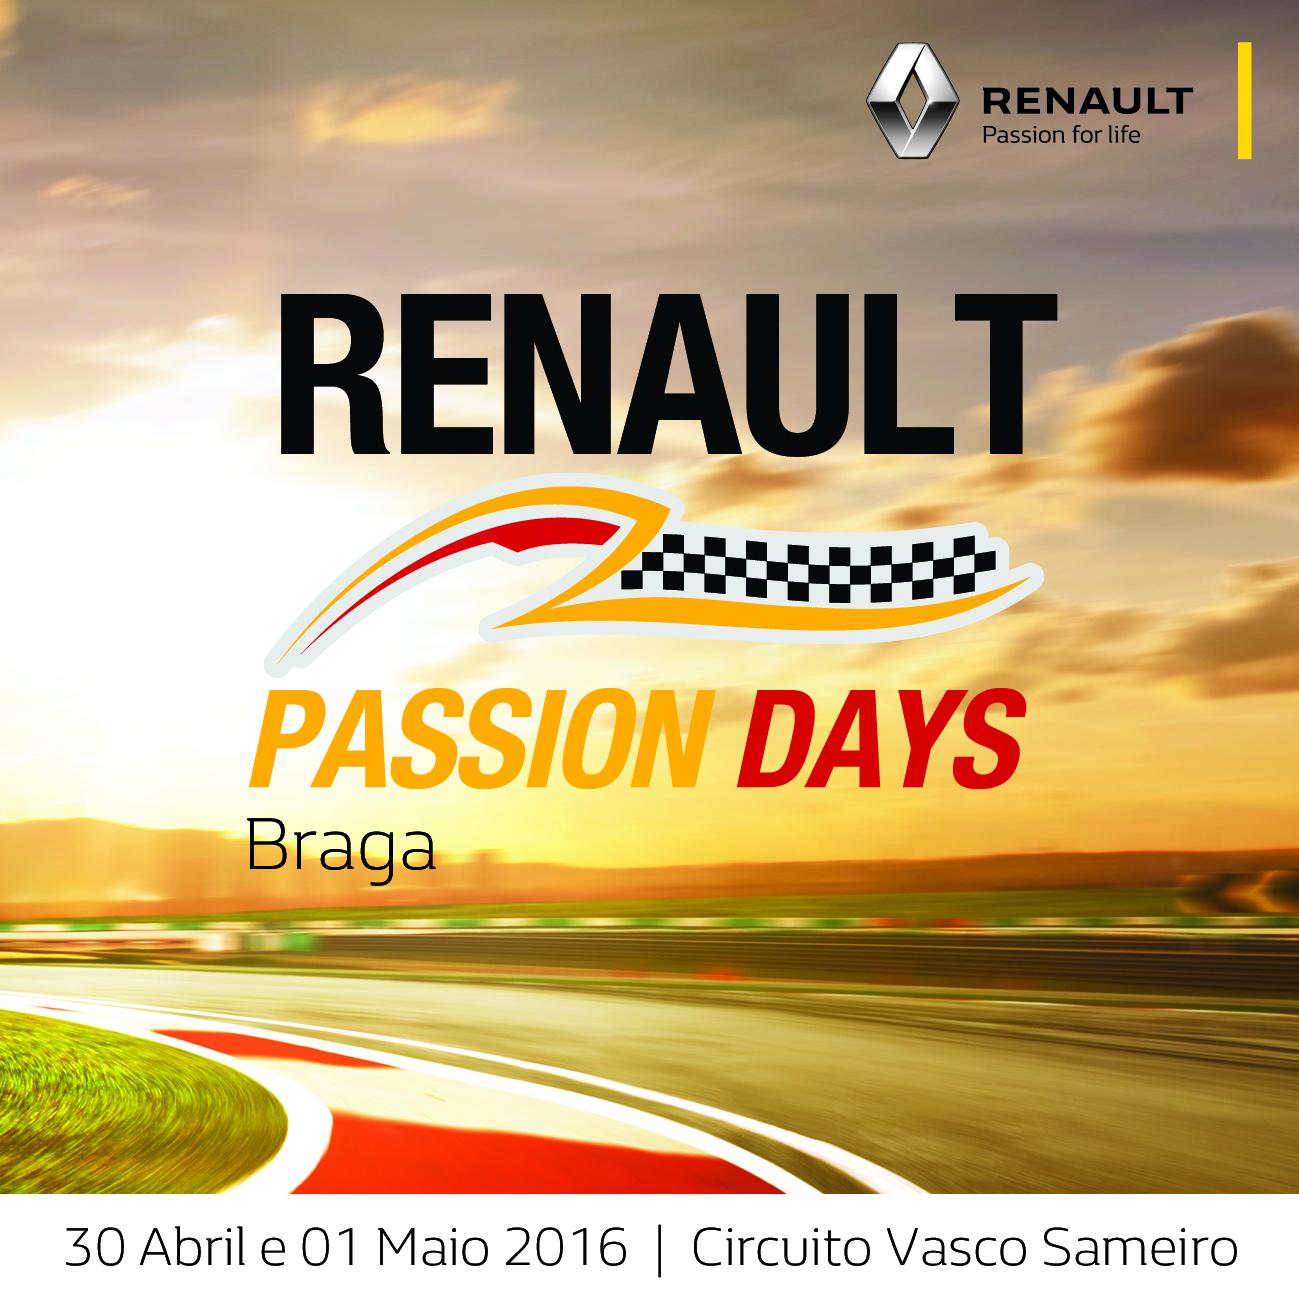 Renault Passion Days Braga